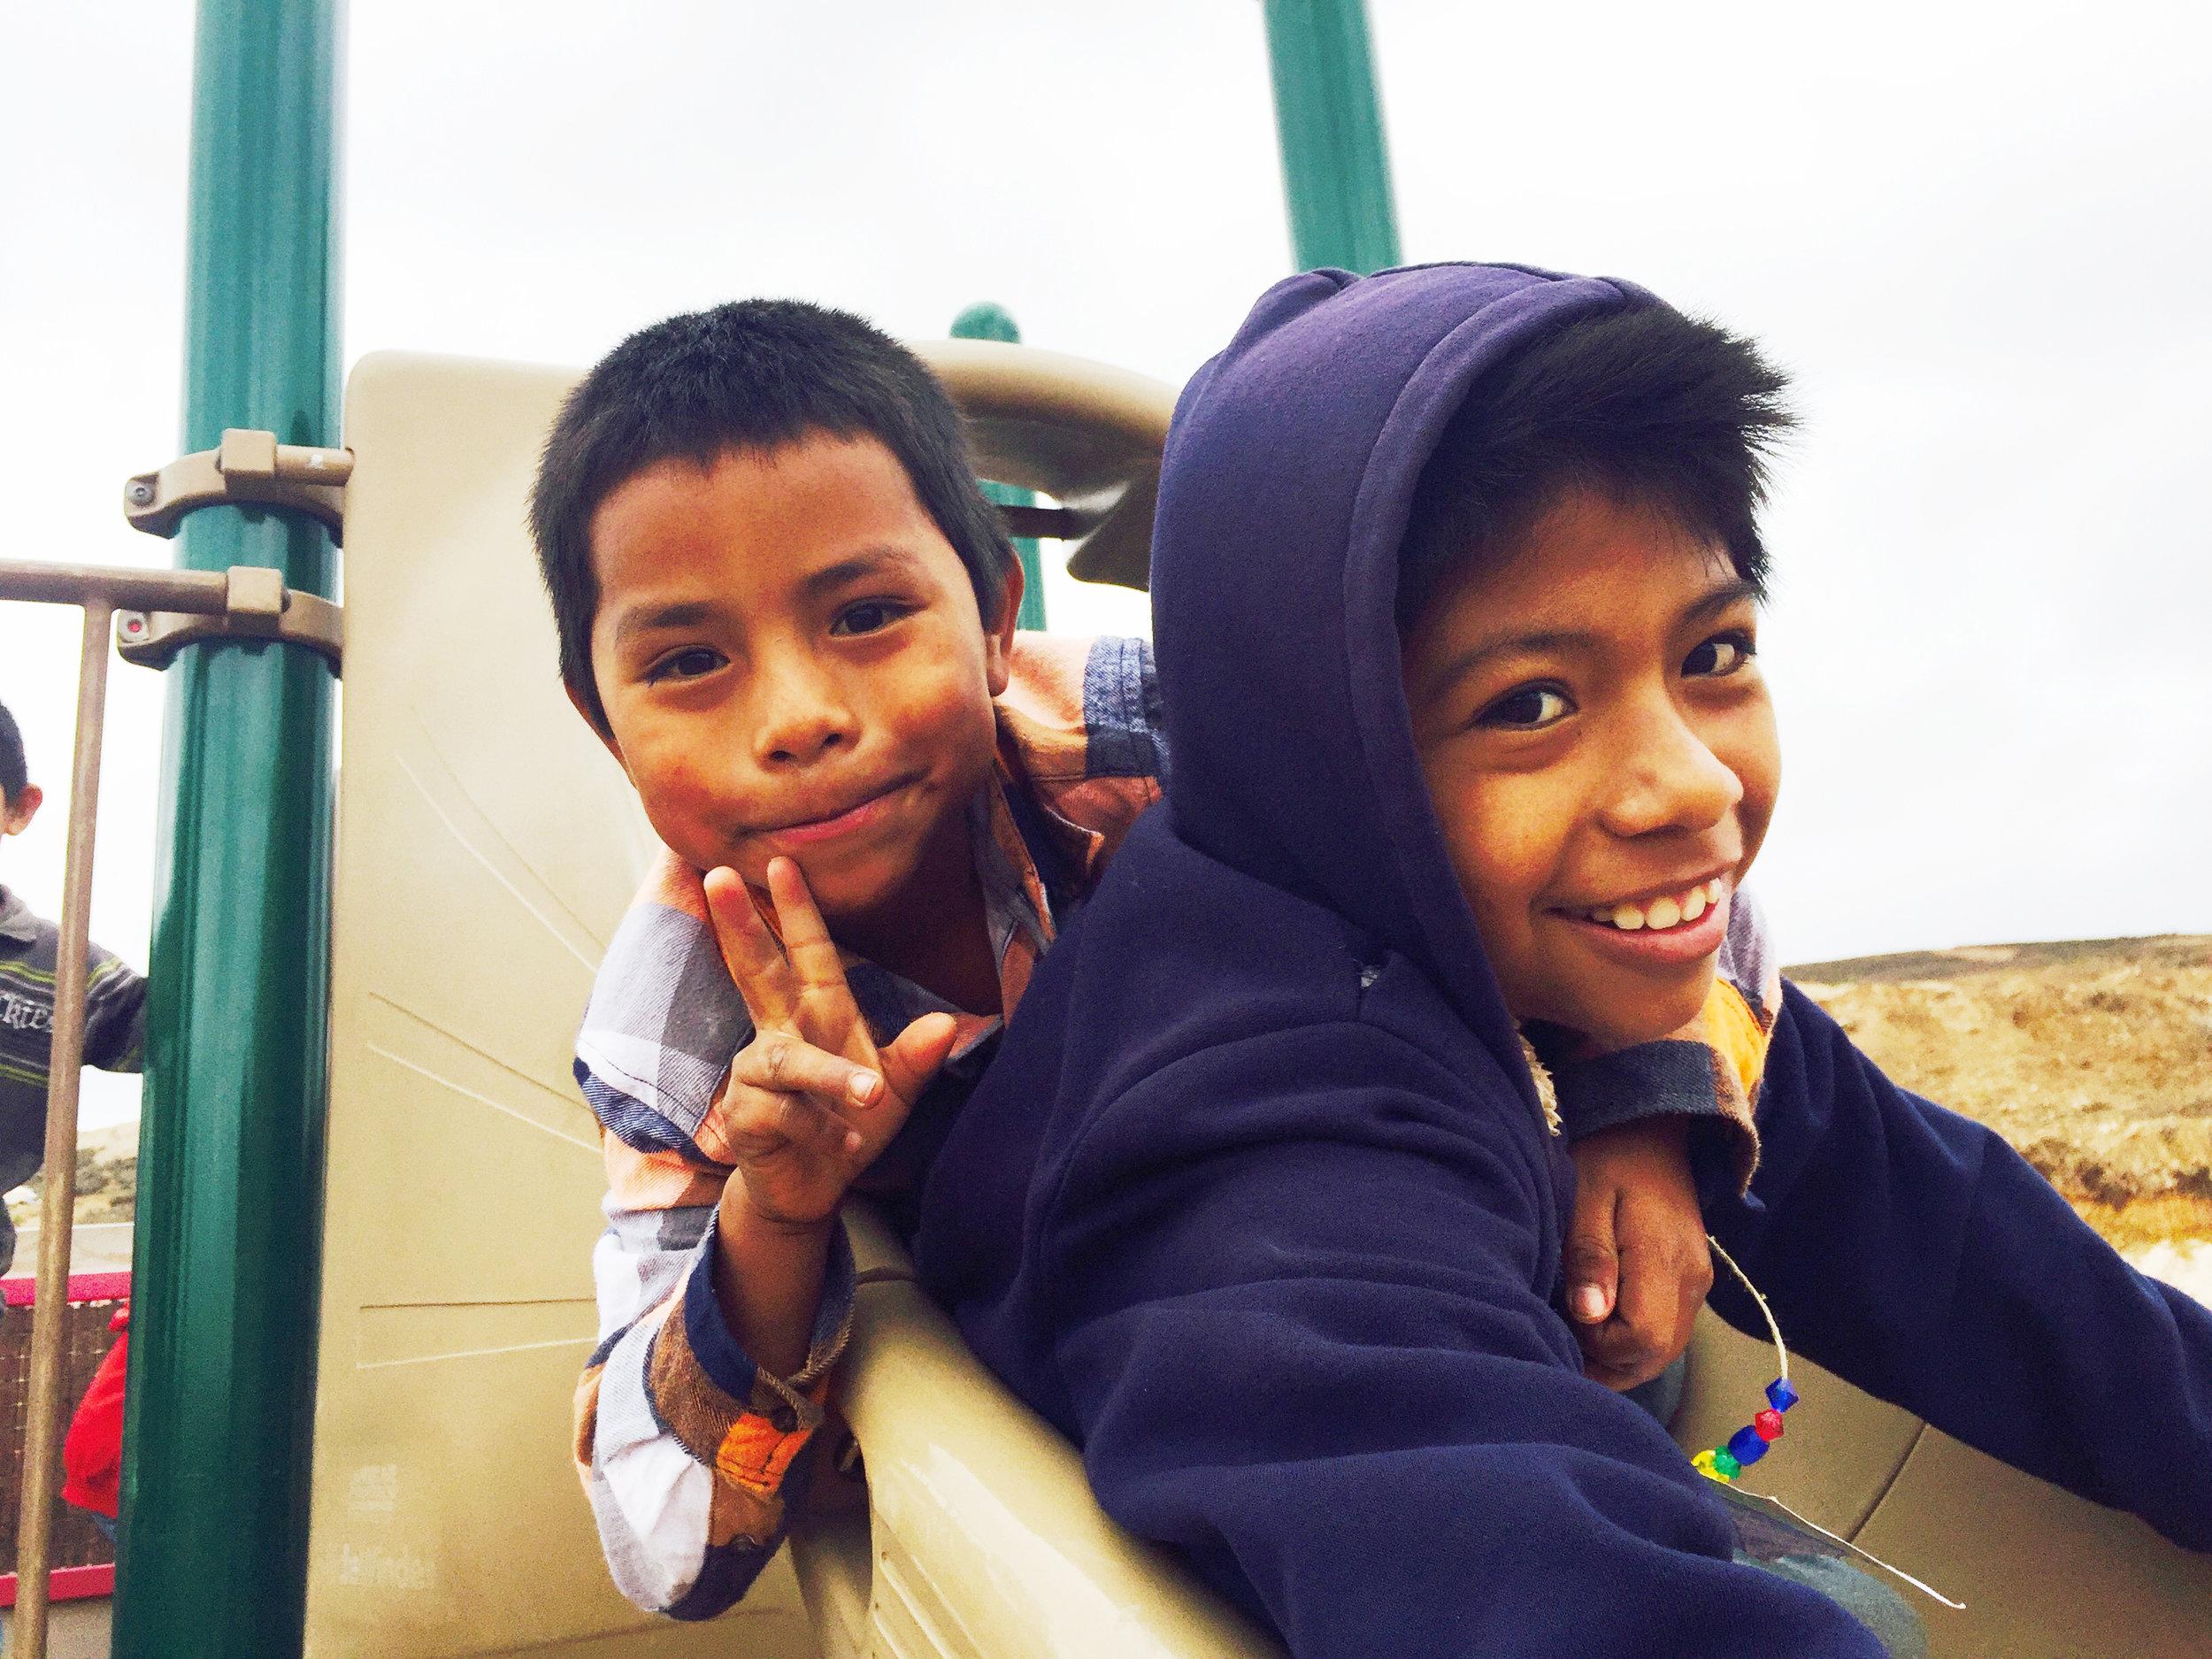 2 boys playground.JPG